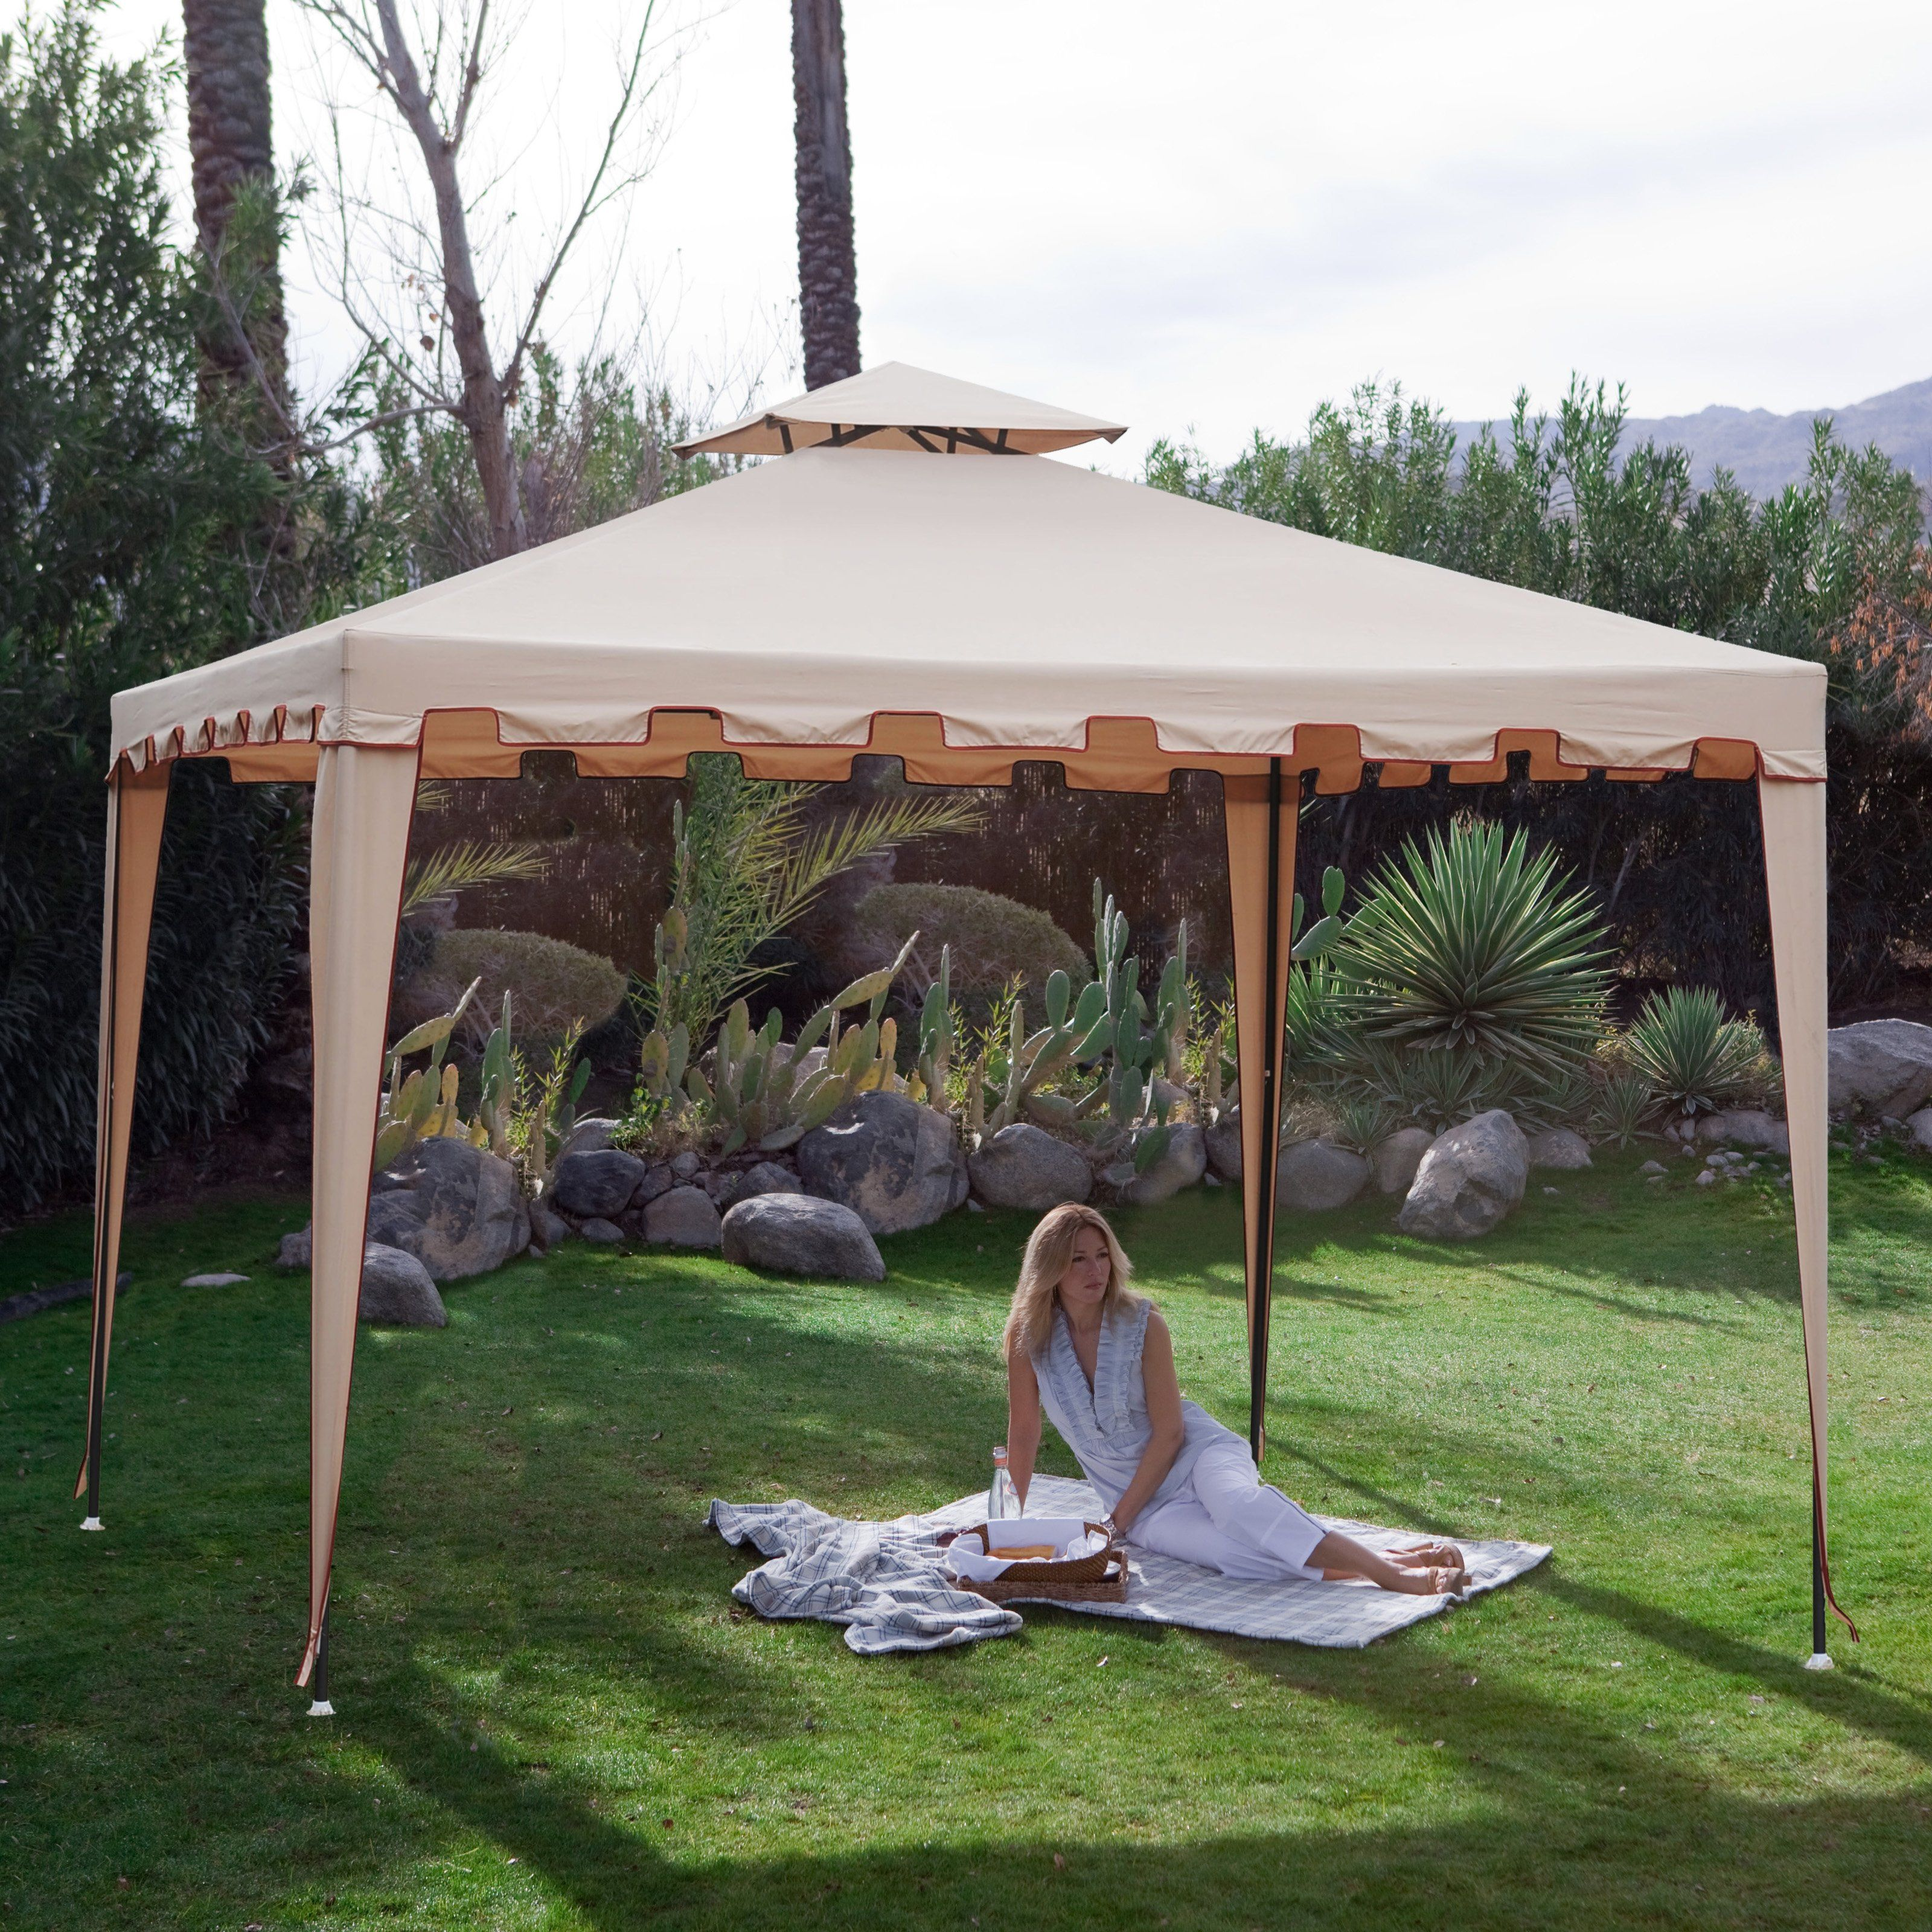 have to have it backyard festival 10 x 10 ft gazebo canopy